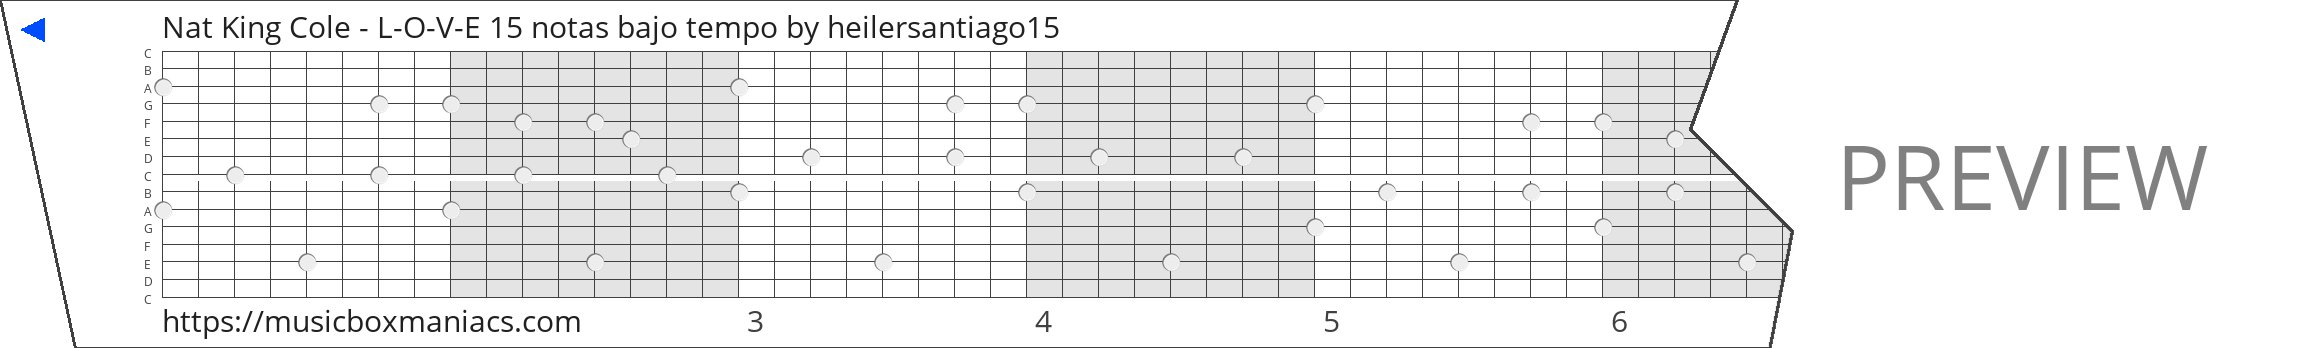 Nat King Cole - L-O-V-E 15 notas bajo tempo 15 note music box paper strip